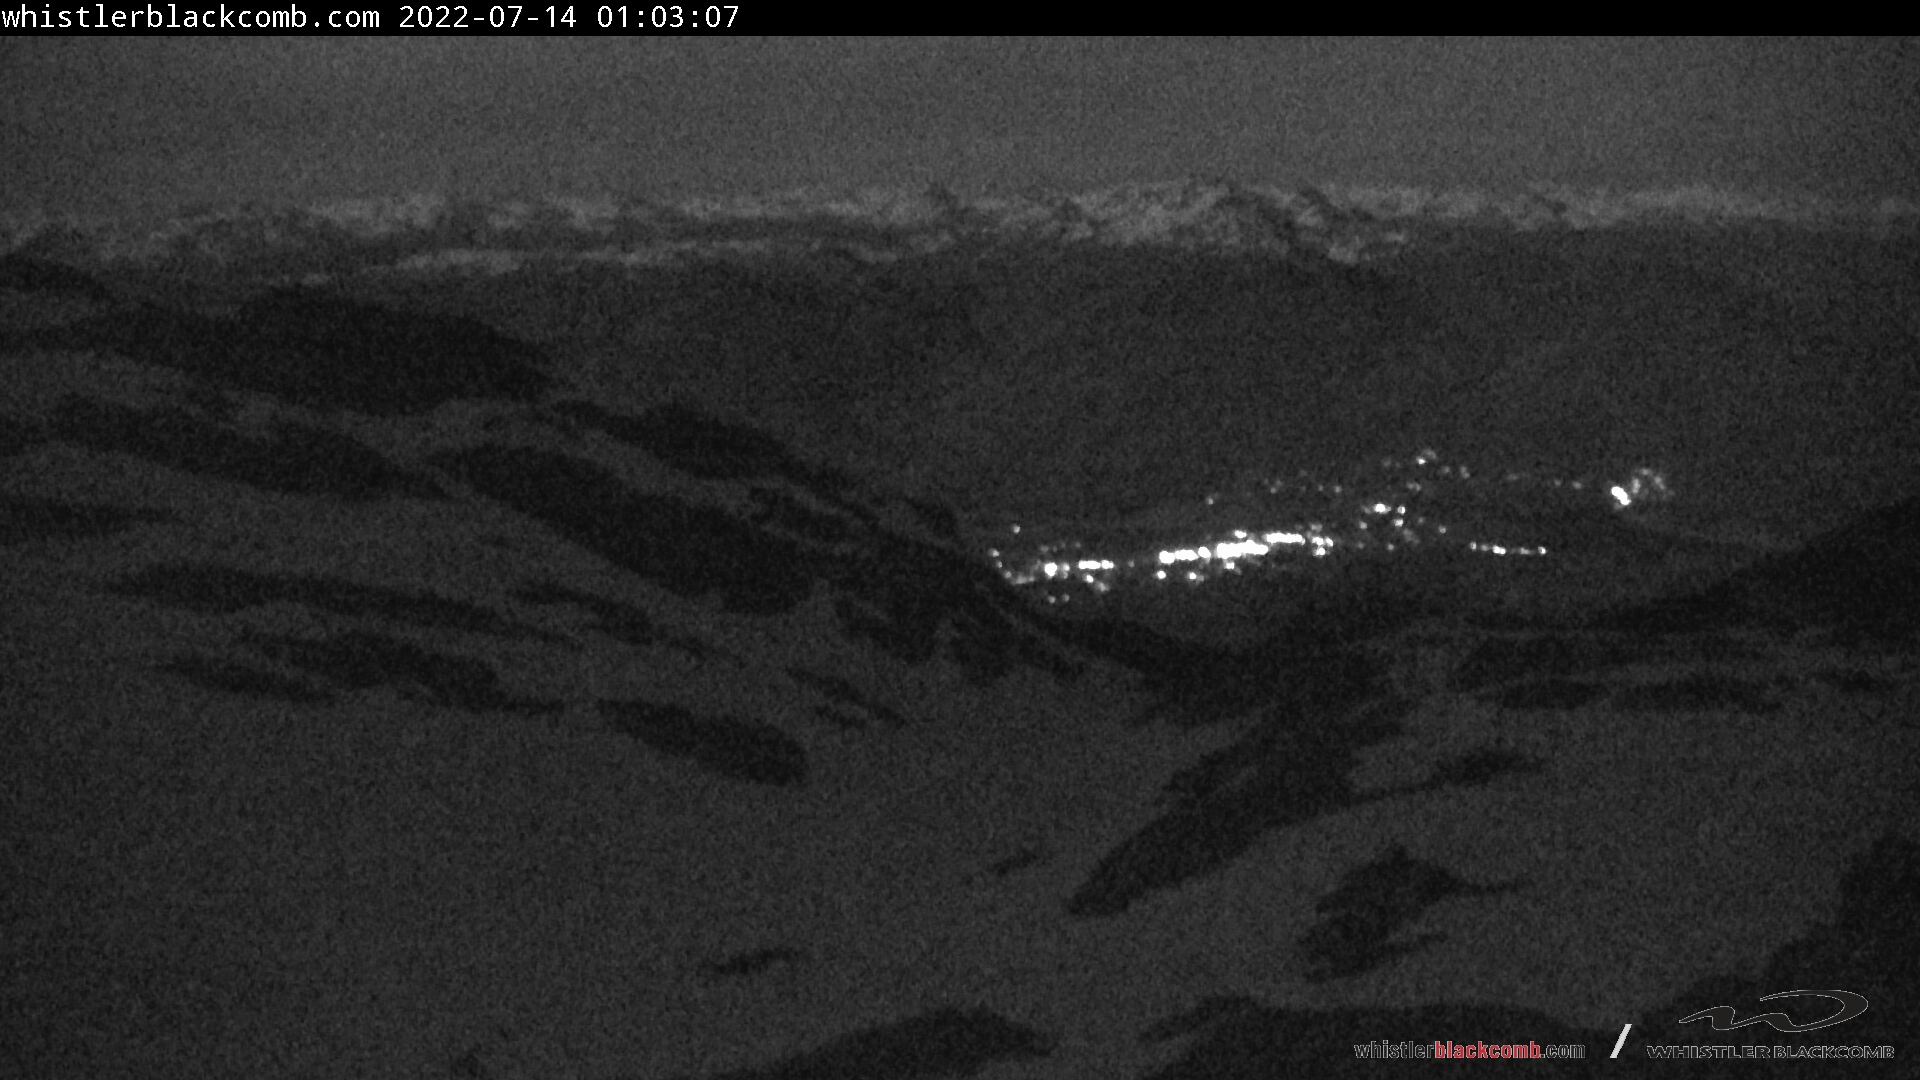 Horstman Glacier - Bottom